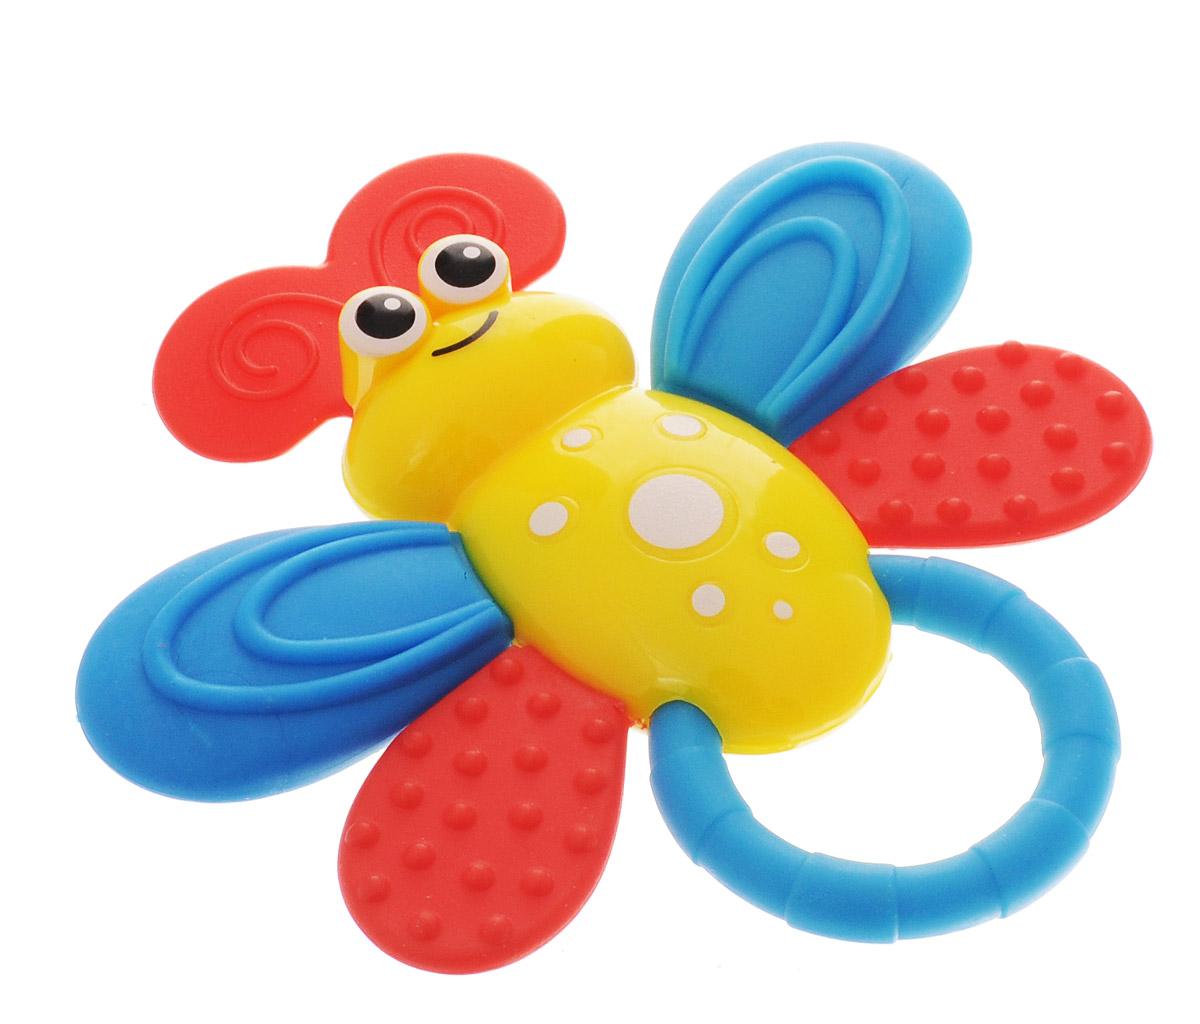 Bondibon Погремушка Пчелка цвет желтый bondibon мягкая игрушка погремушка слоник